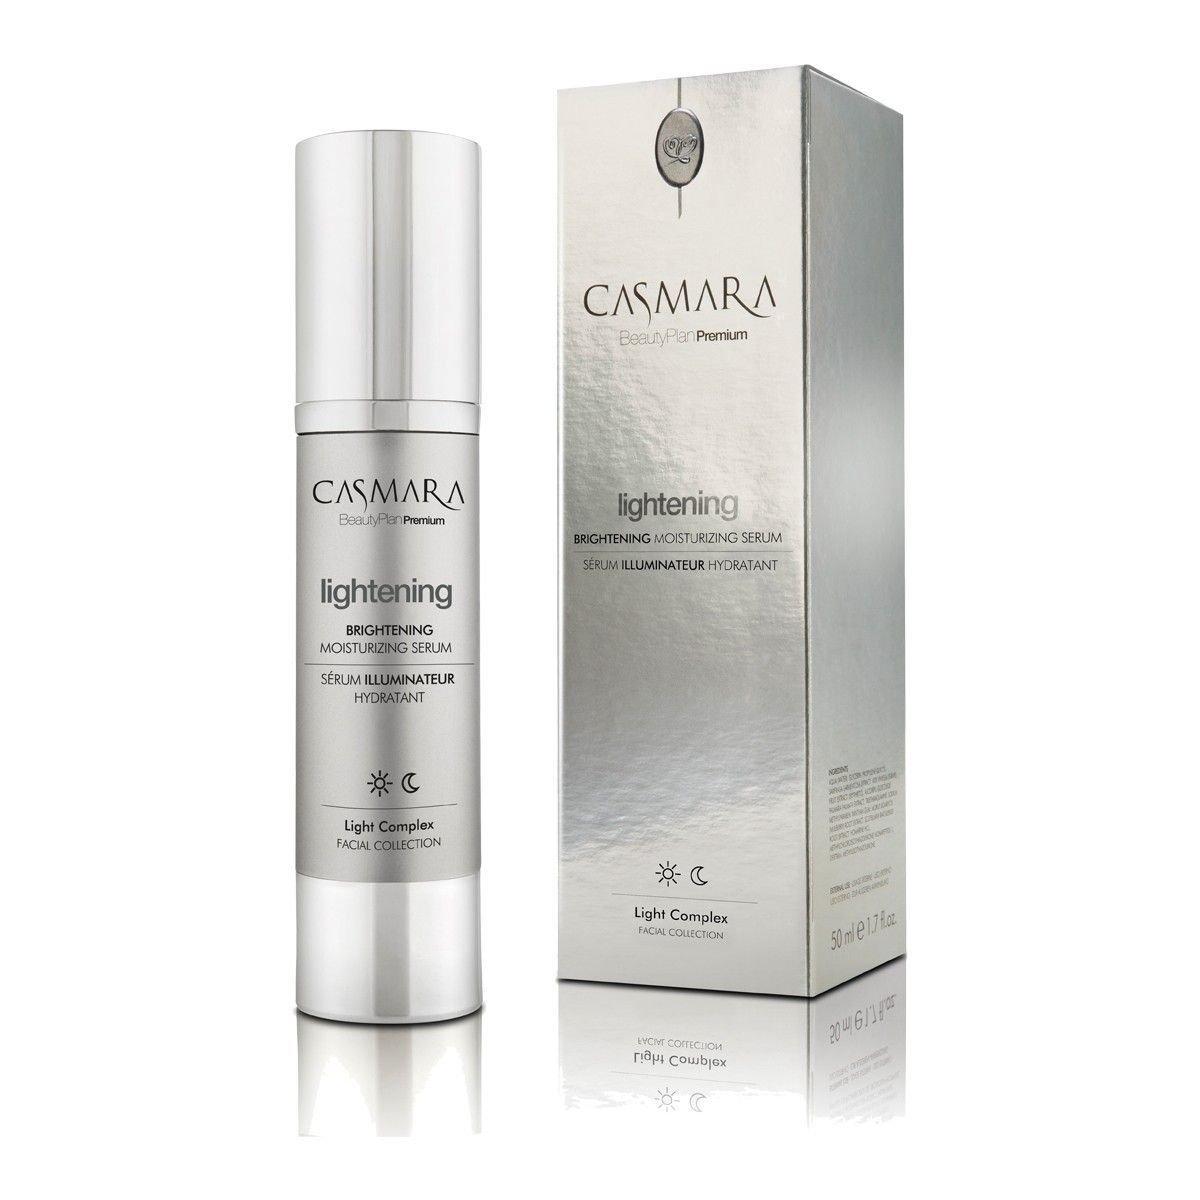 Afbeelding van Casmara Brightening Moisturizing Serum 50Ml Lightening / Clarifying